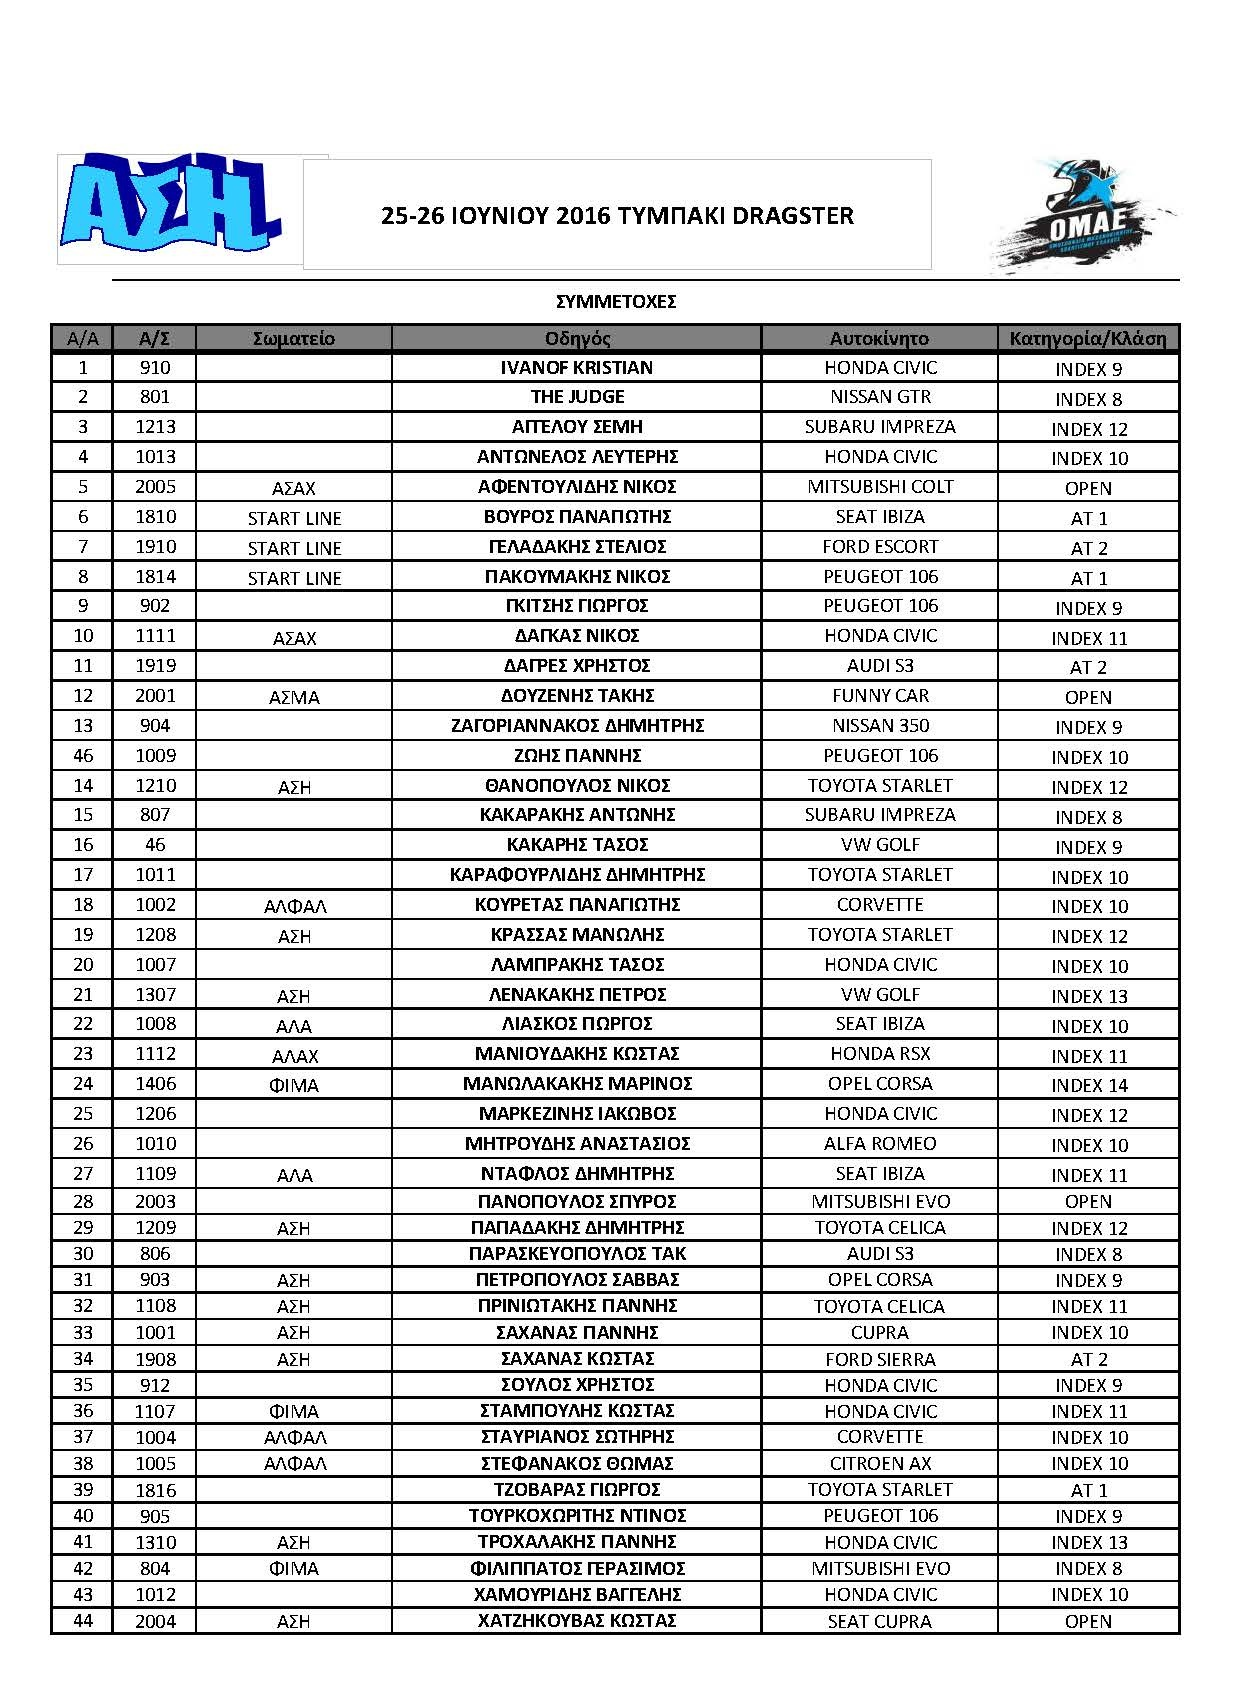 3os-agonas-protathlimatos-drag-racing 2016-symmetoxes